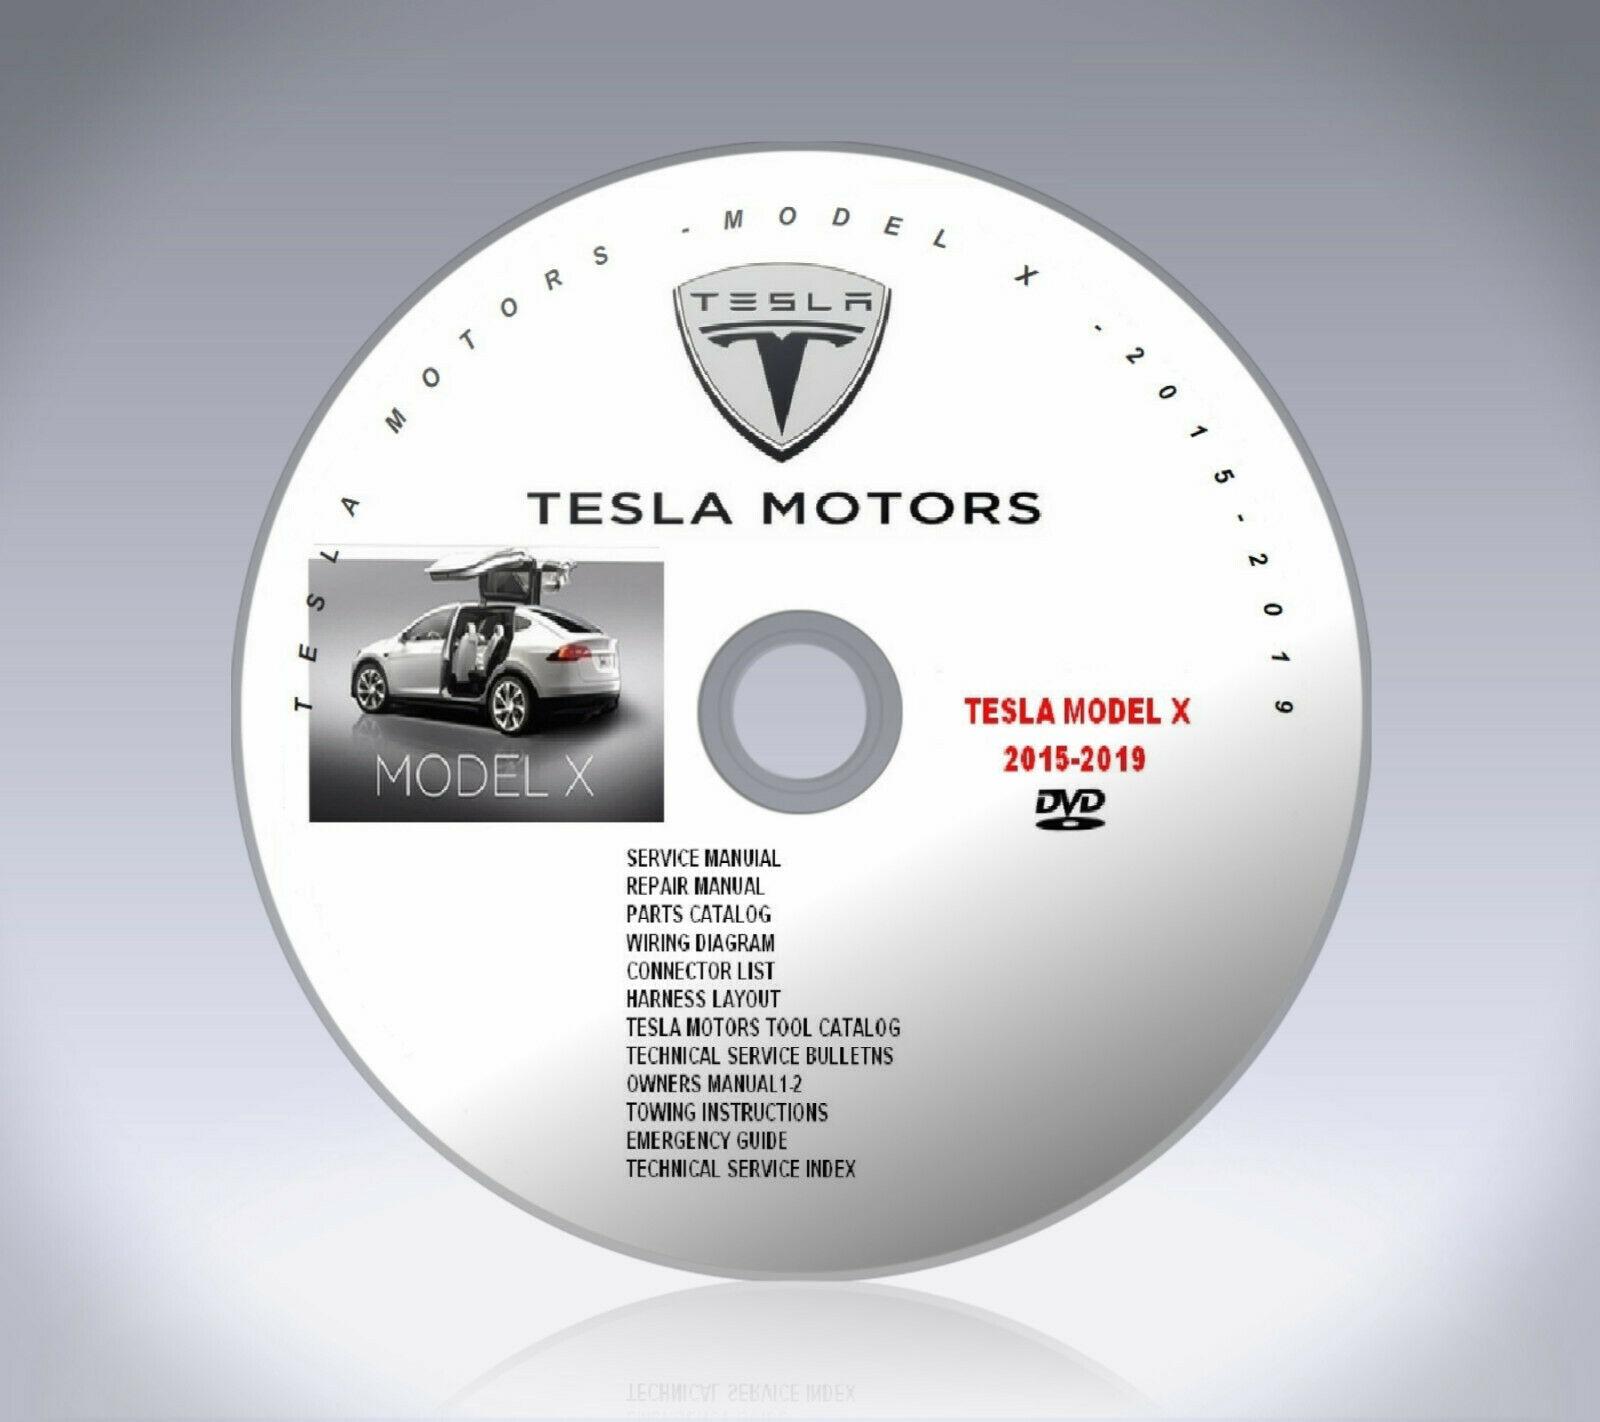 Tesla_Model_X-Full_Collection_2015-2019_Service_Repair_Manuals_Part_Catalog_DVD_0